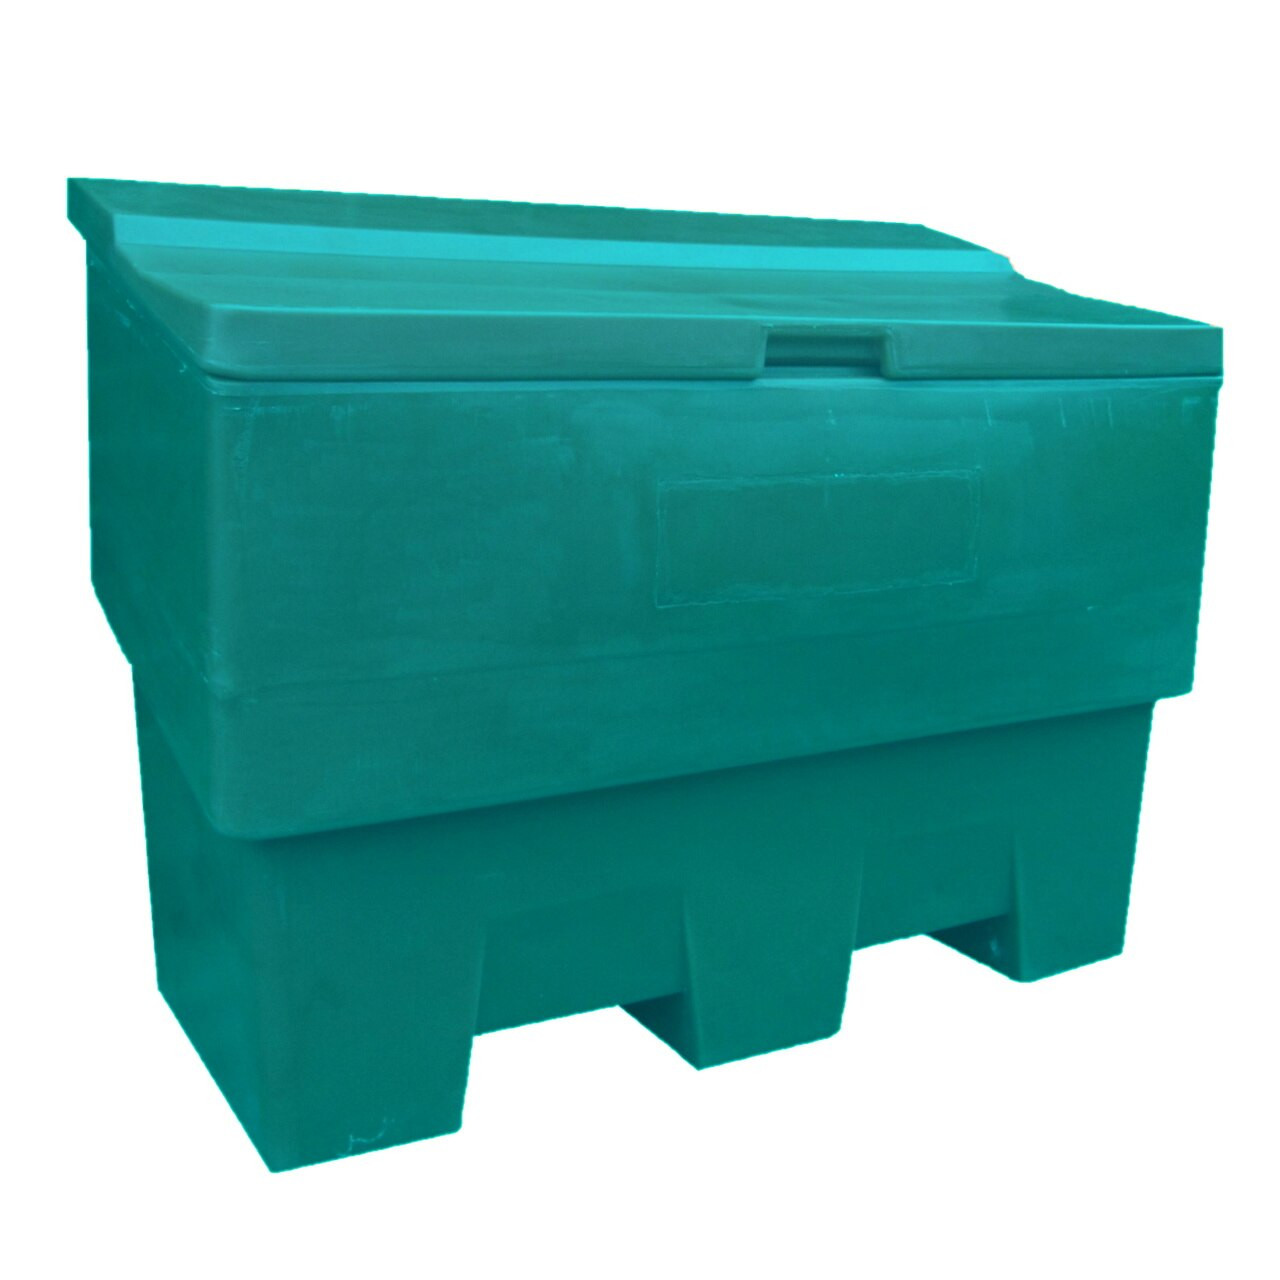 Green 285 Litre outdoor storage box